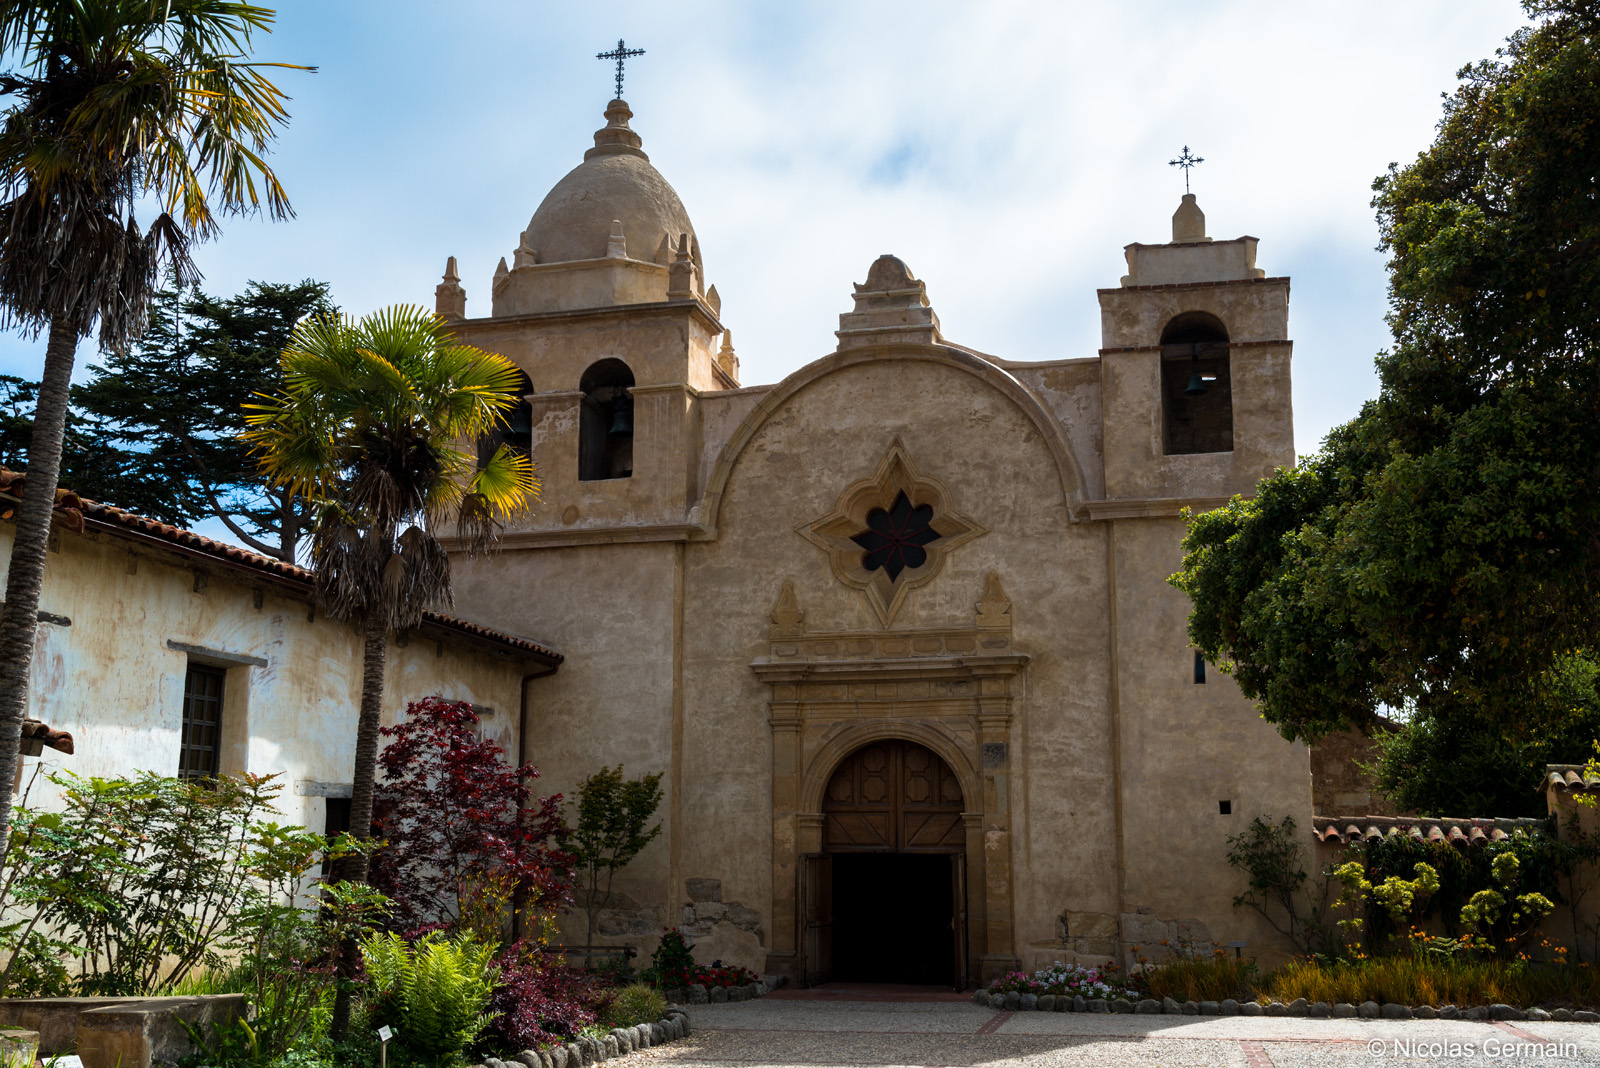 Mission San Carlos Borromeo à Carmel, Californie